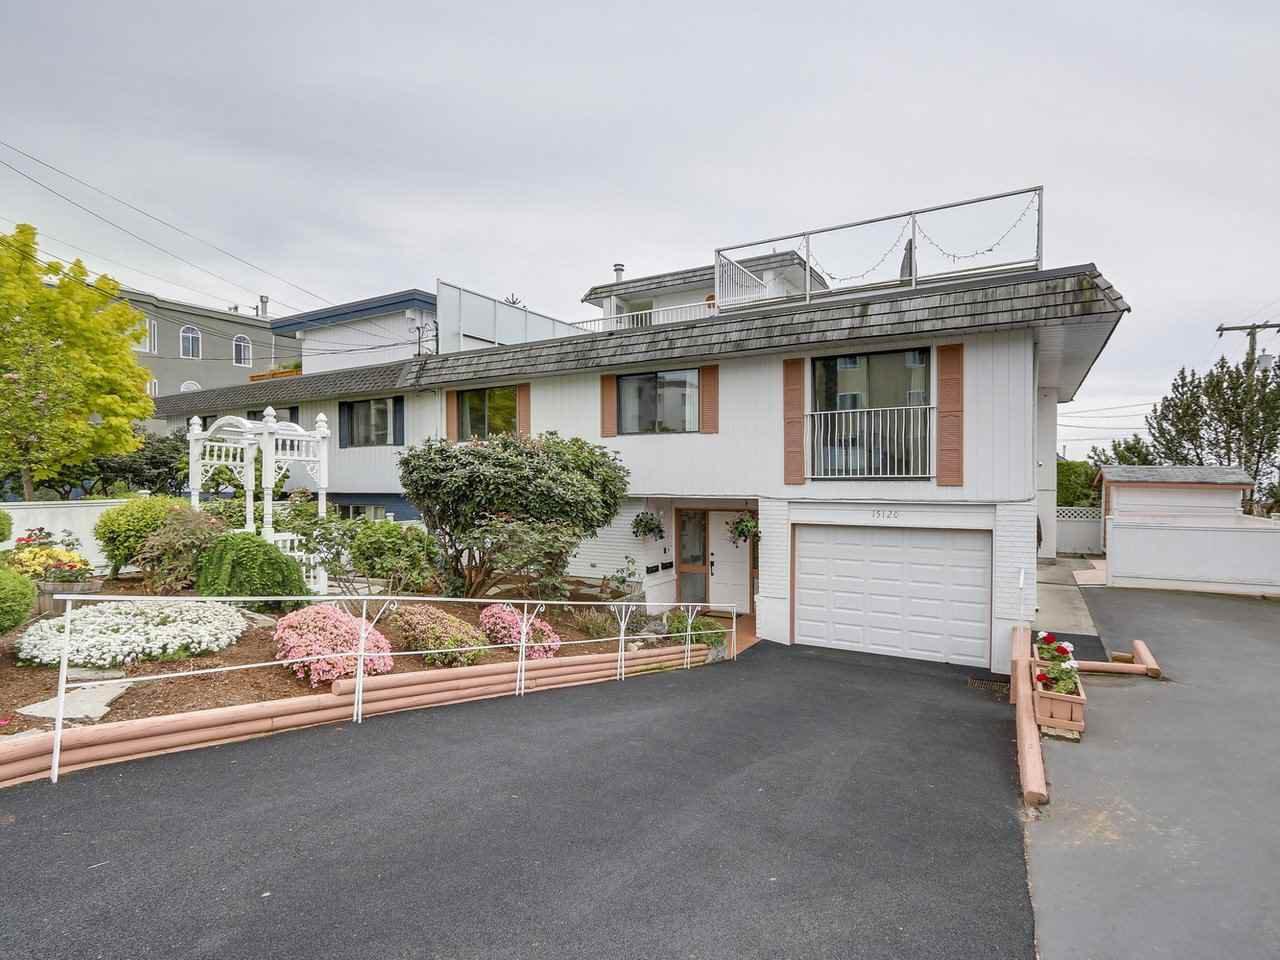 Main Photo: 15120 PROSPECT AVENUE: White Rock House 1/2 Duplex for sale (South Surrey White Rock)  : MLS®# R2165190